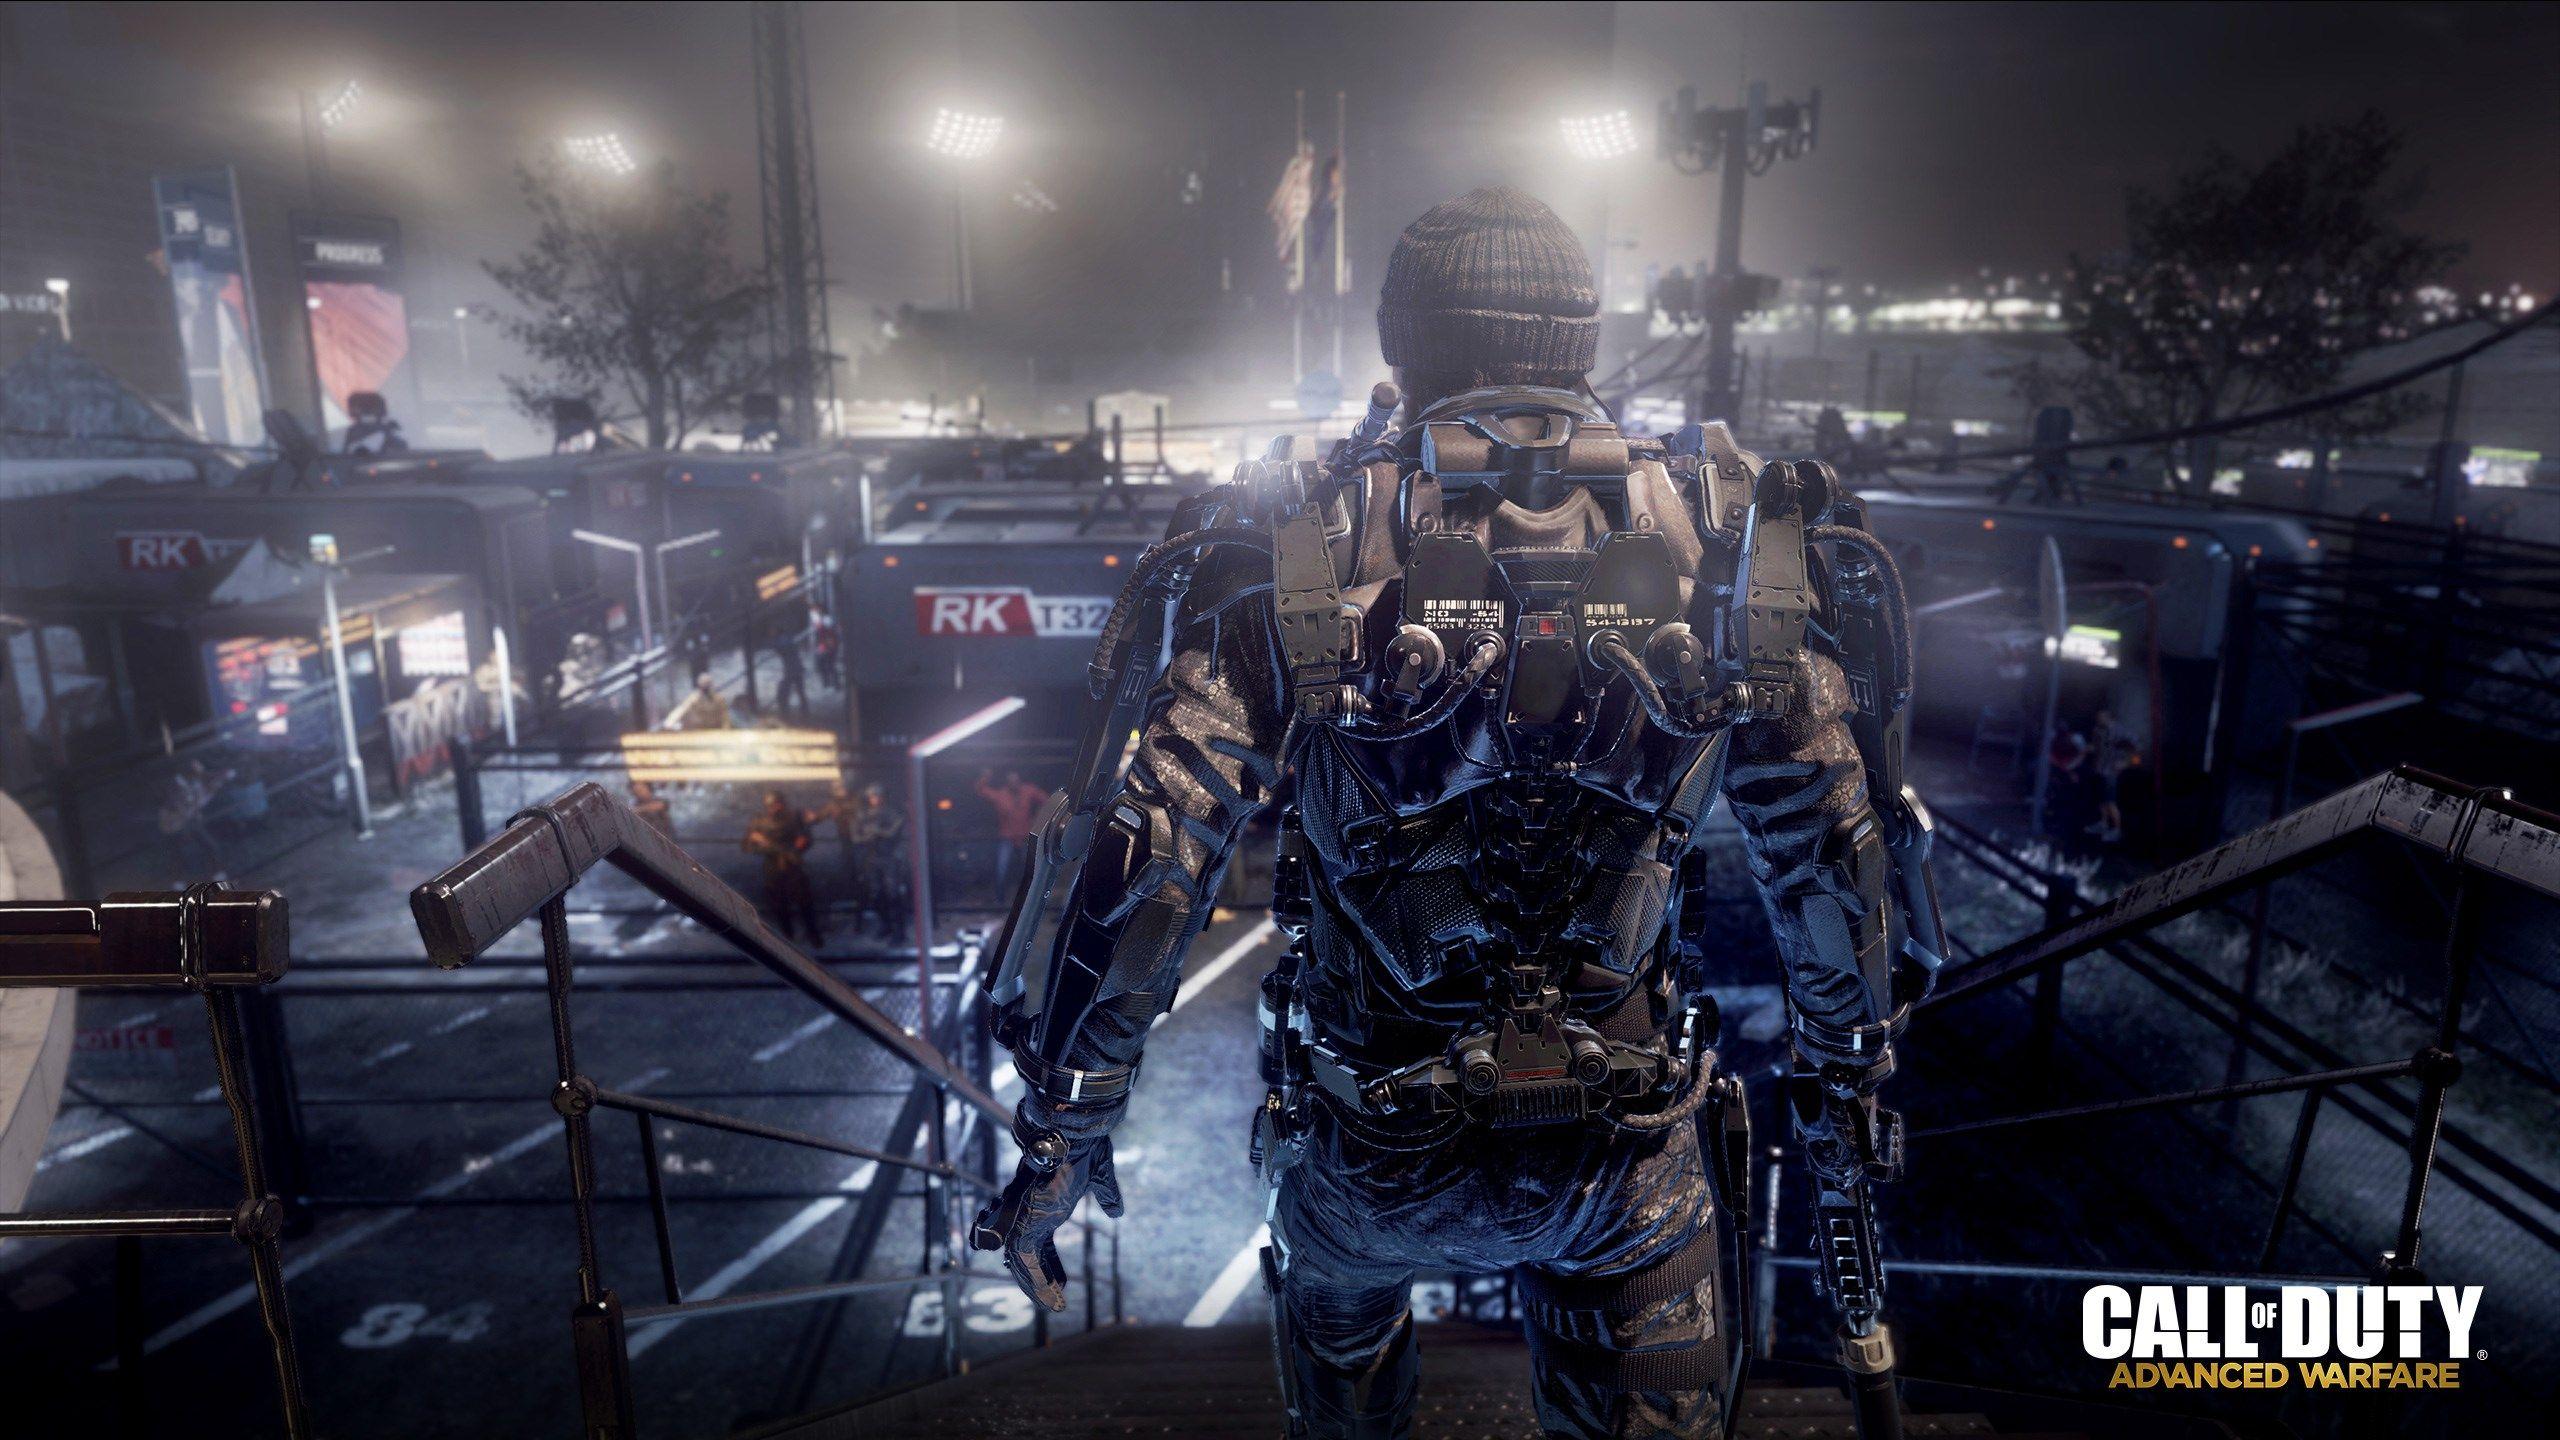 Call Of Duty Advanced Warfare Exoskeleton Zombie 2560x1440 Wallpaper Teahub Io